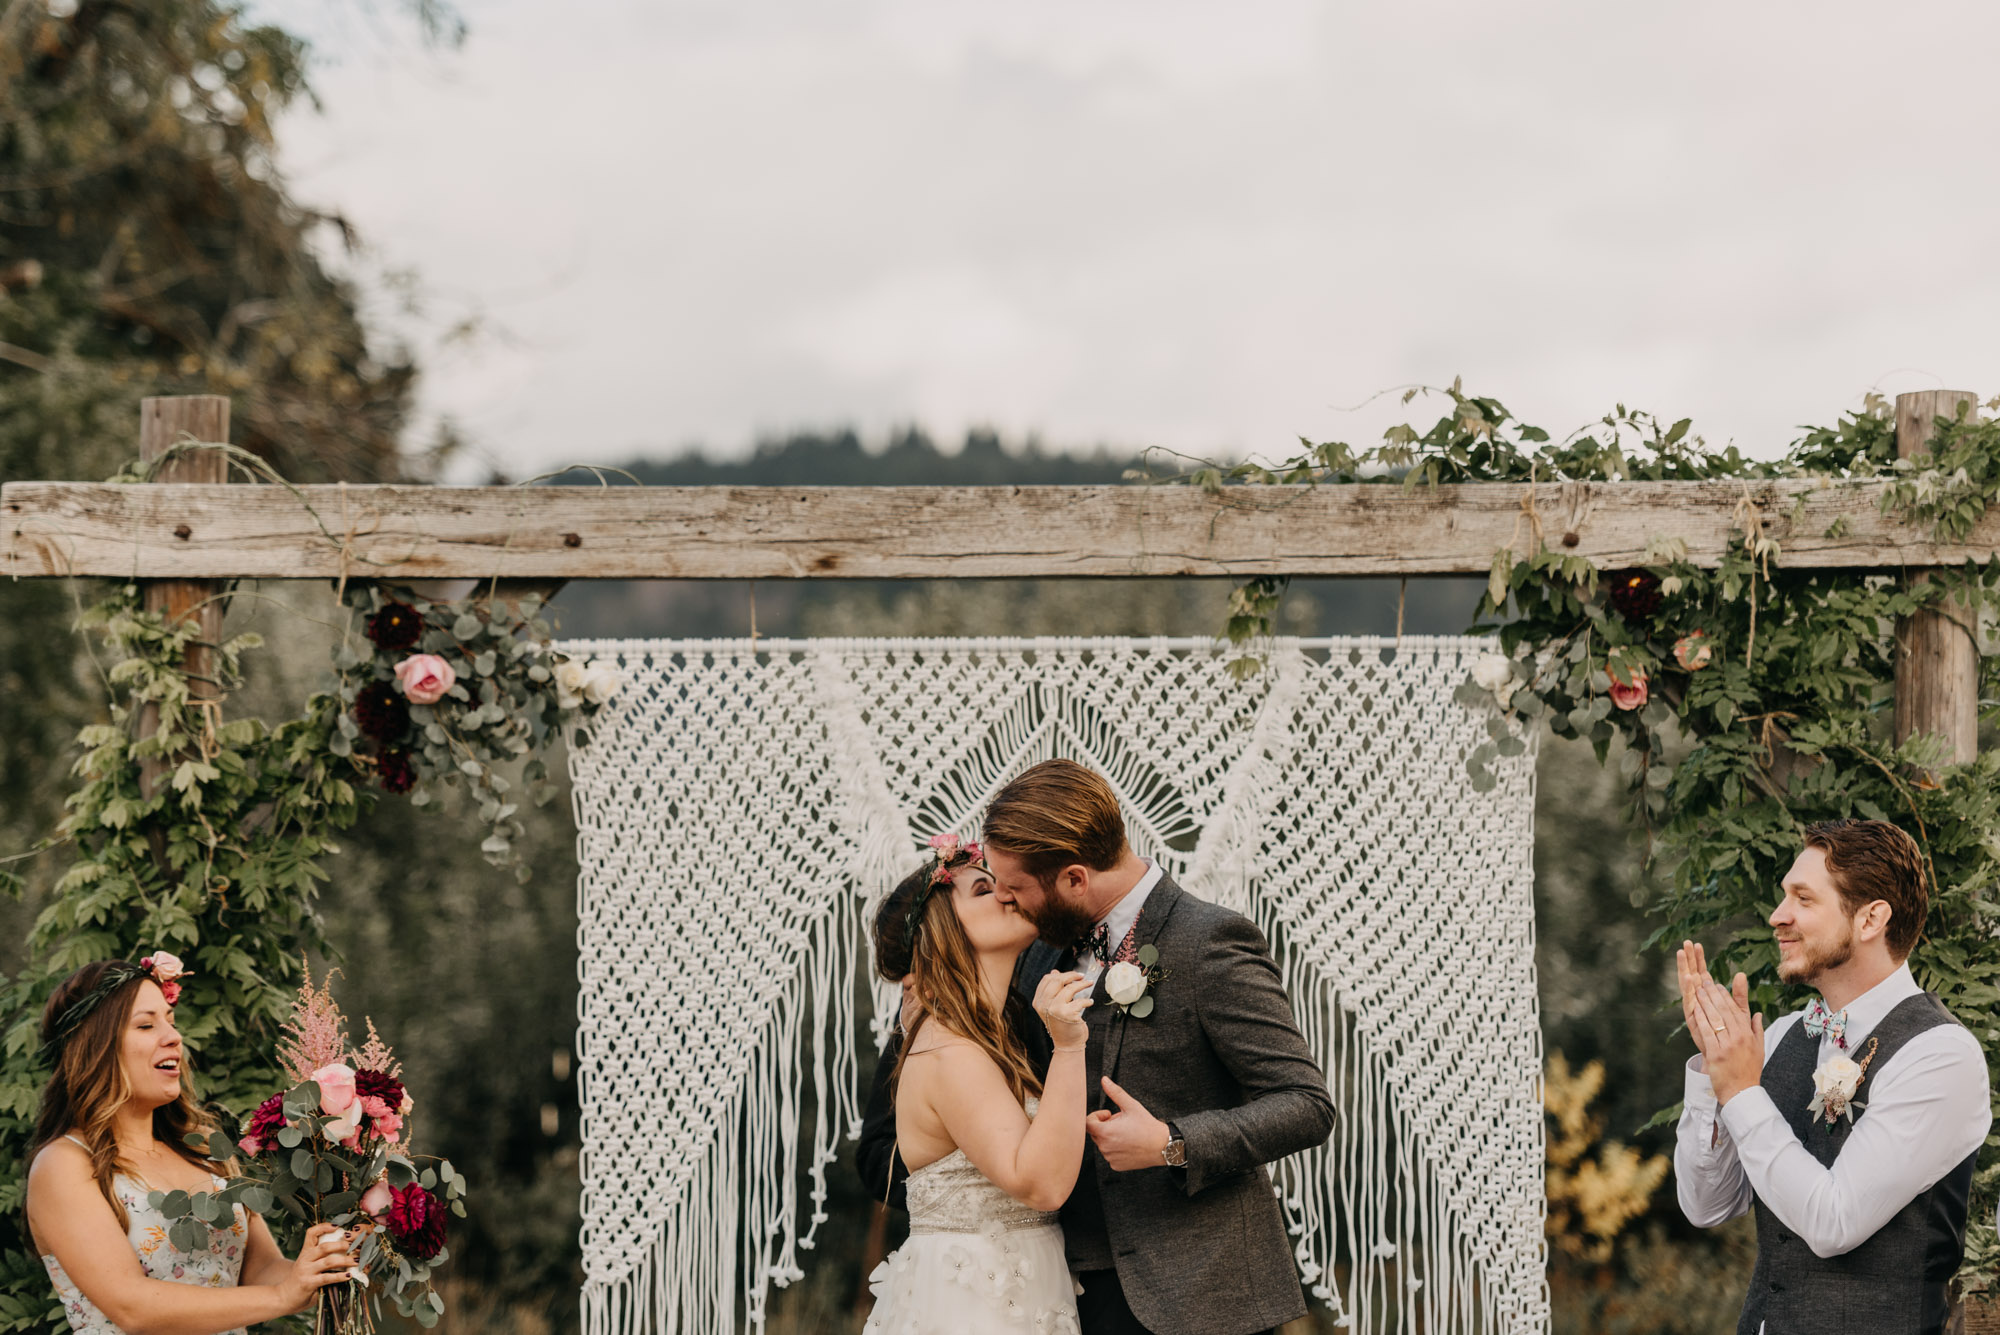 Outdoor-Summer-Ceremony-Washington-Wedding-Rainbow-9141.jpg